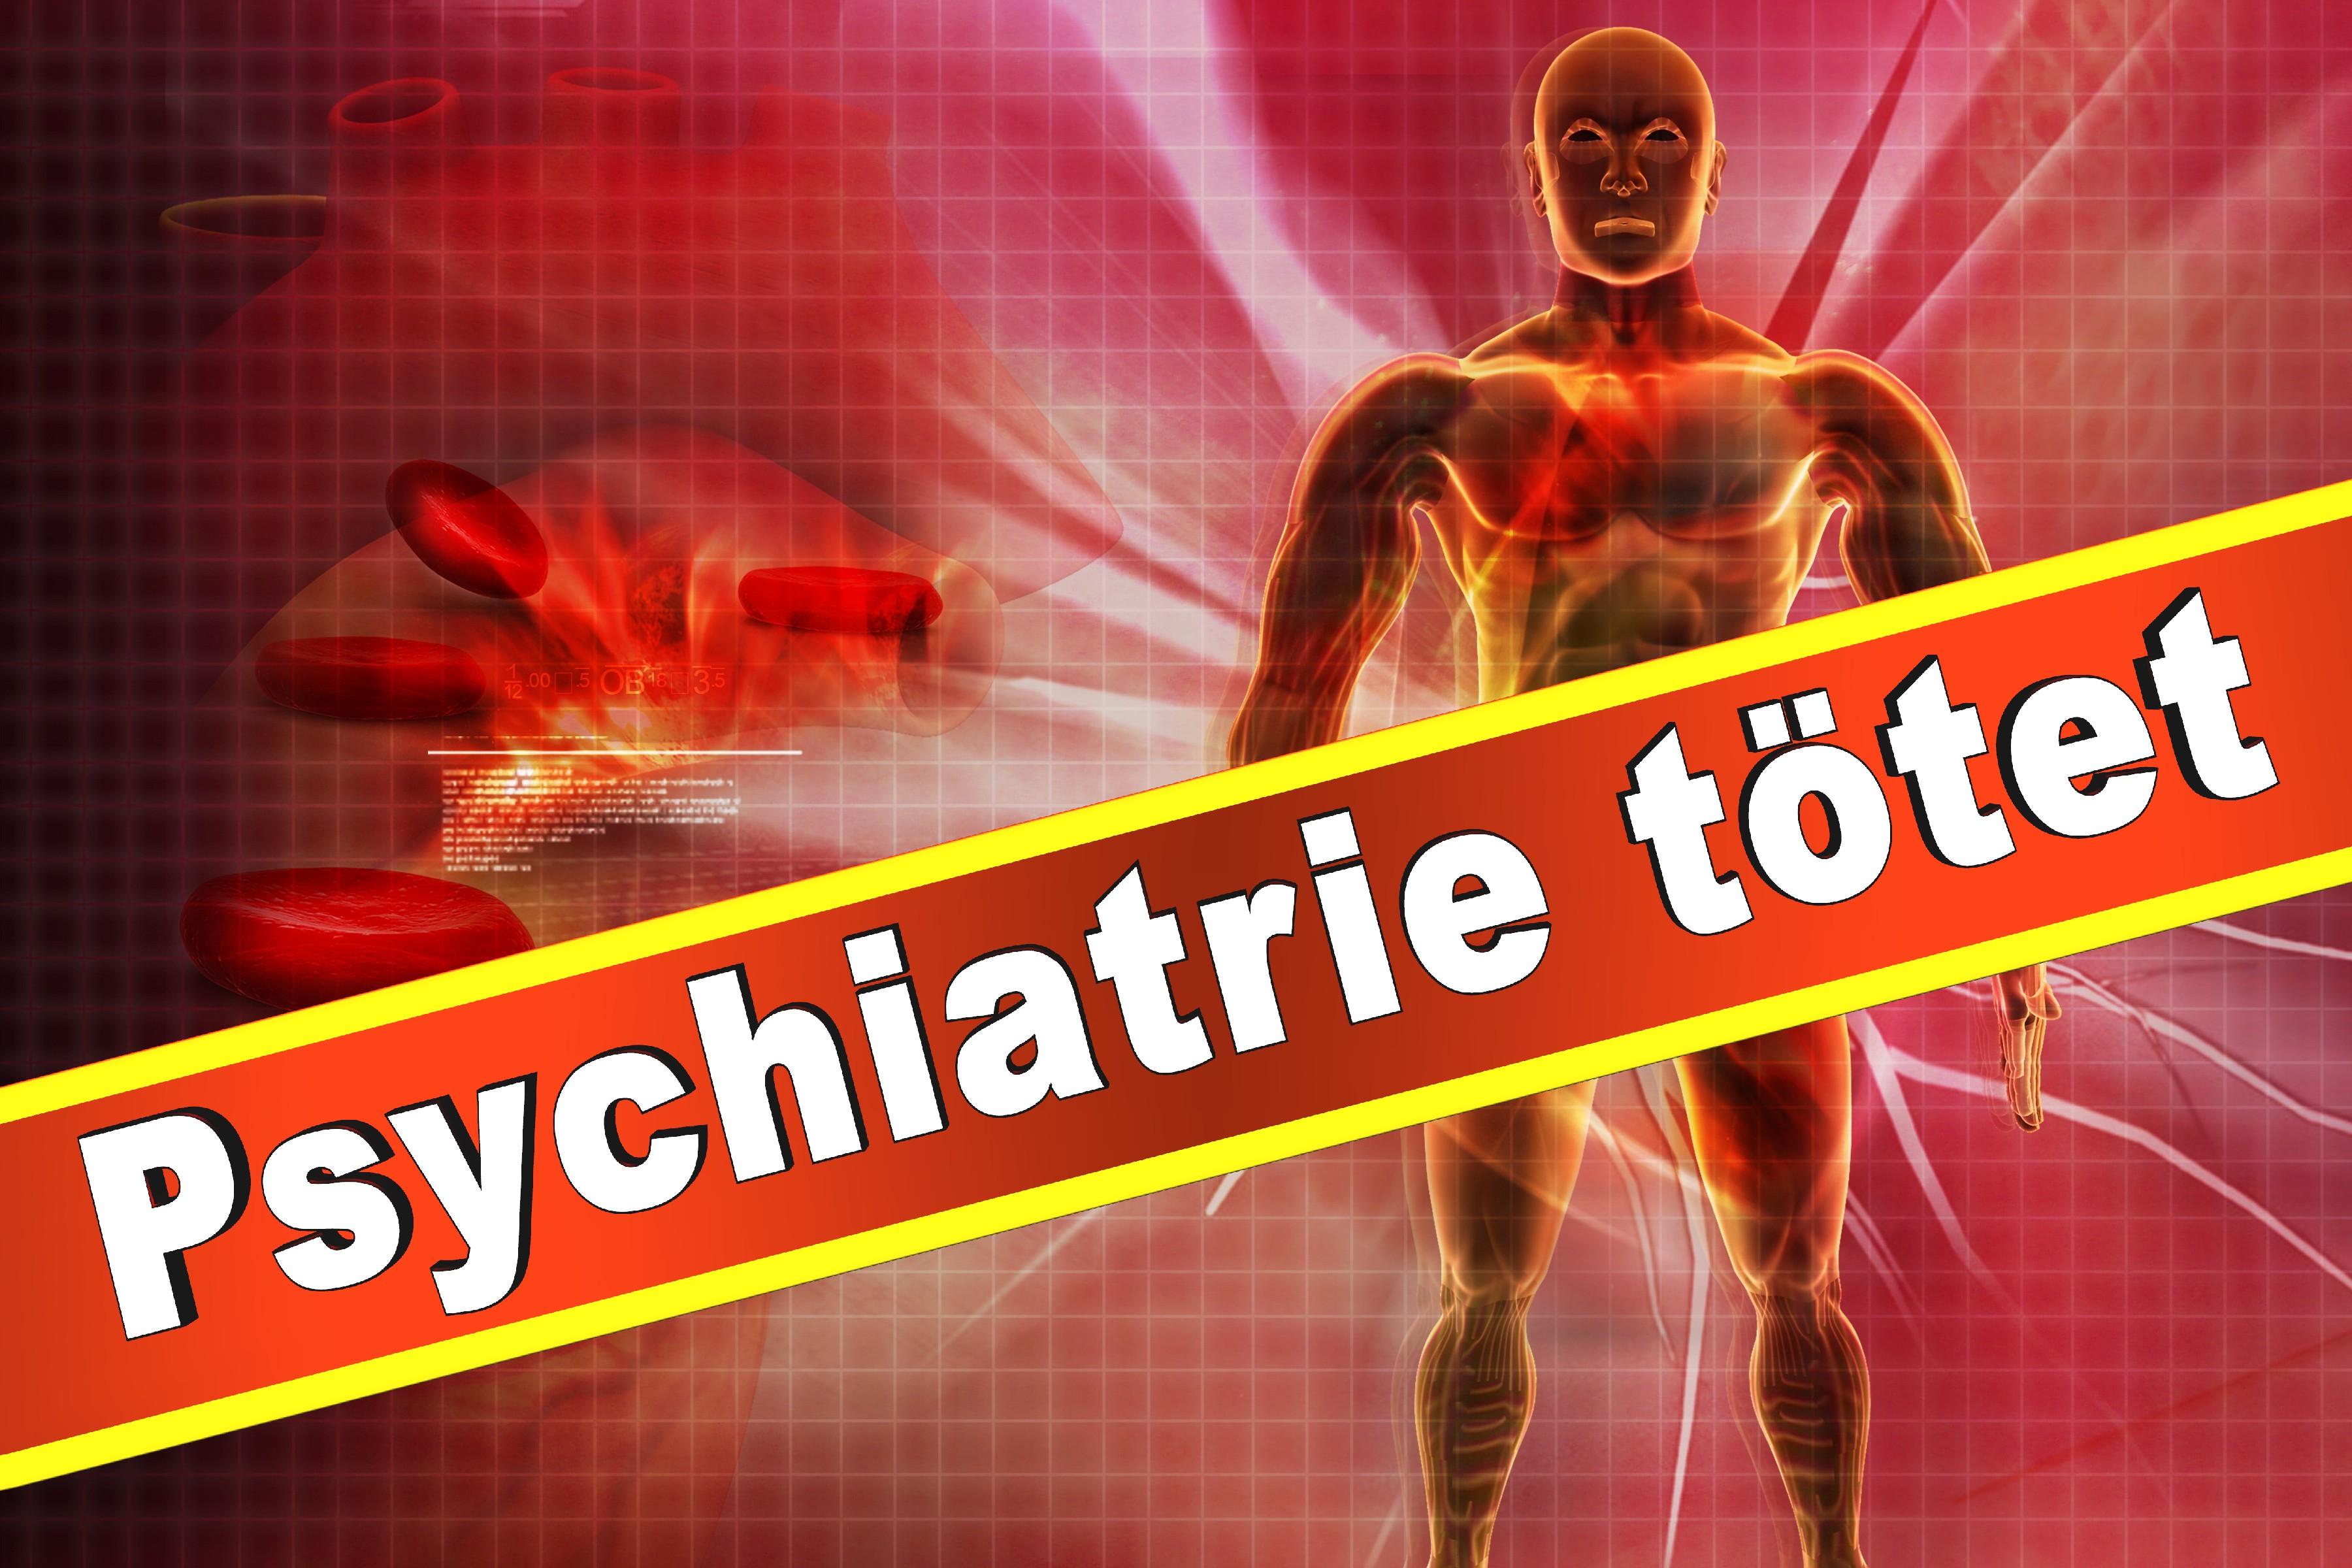 Mental Health Clinic Hannover Gutachten Psychiater Facharzt Psychiatrie Psychotherapie